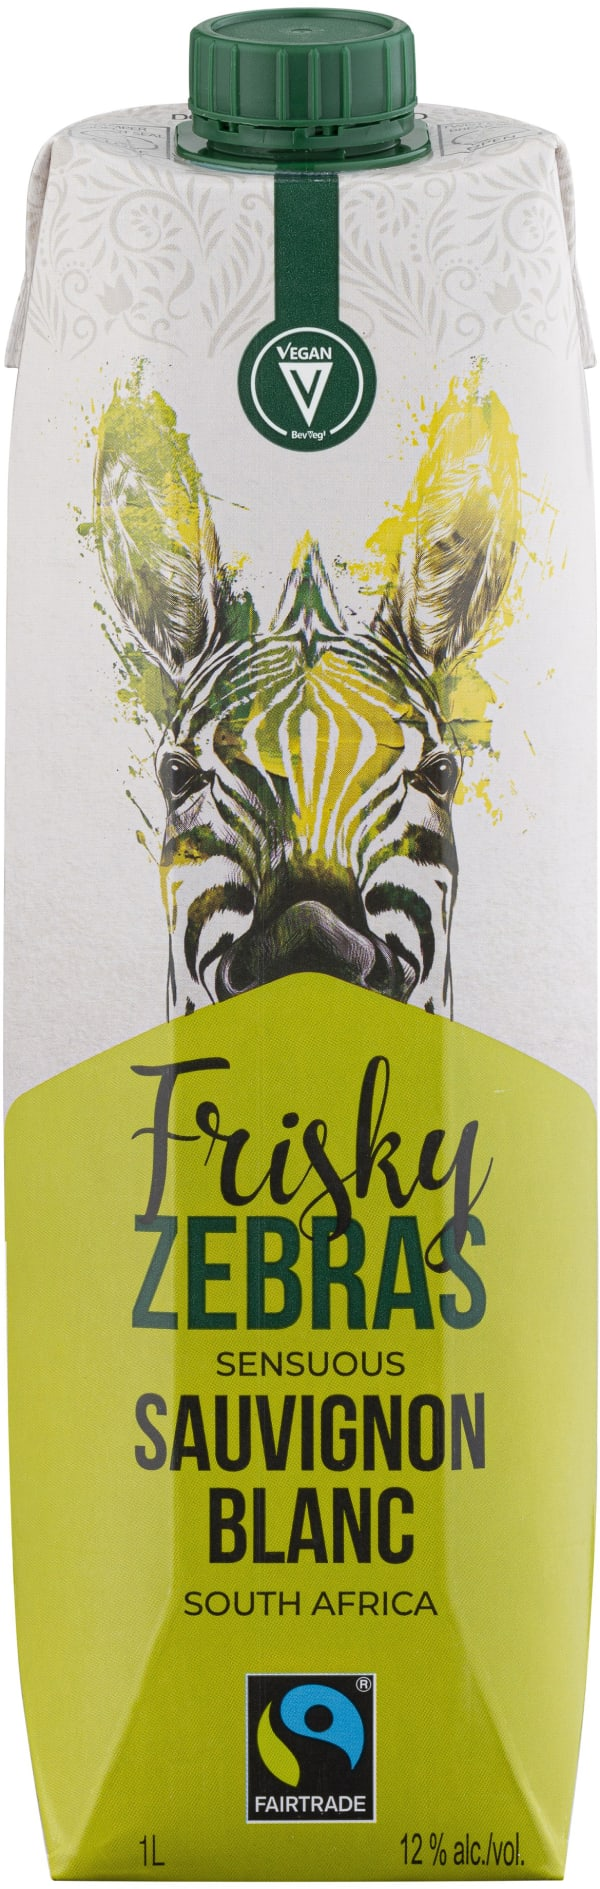 Frisky Zebras Sensuous Sauvignon Blanc  carton package